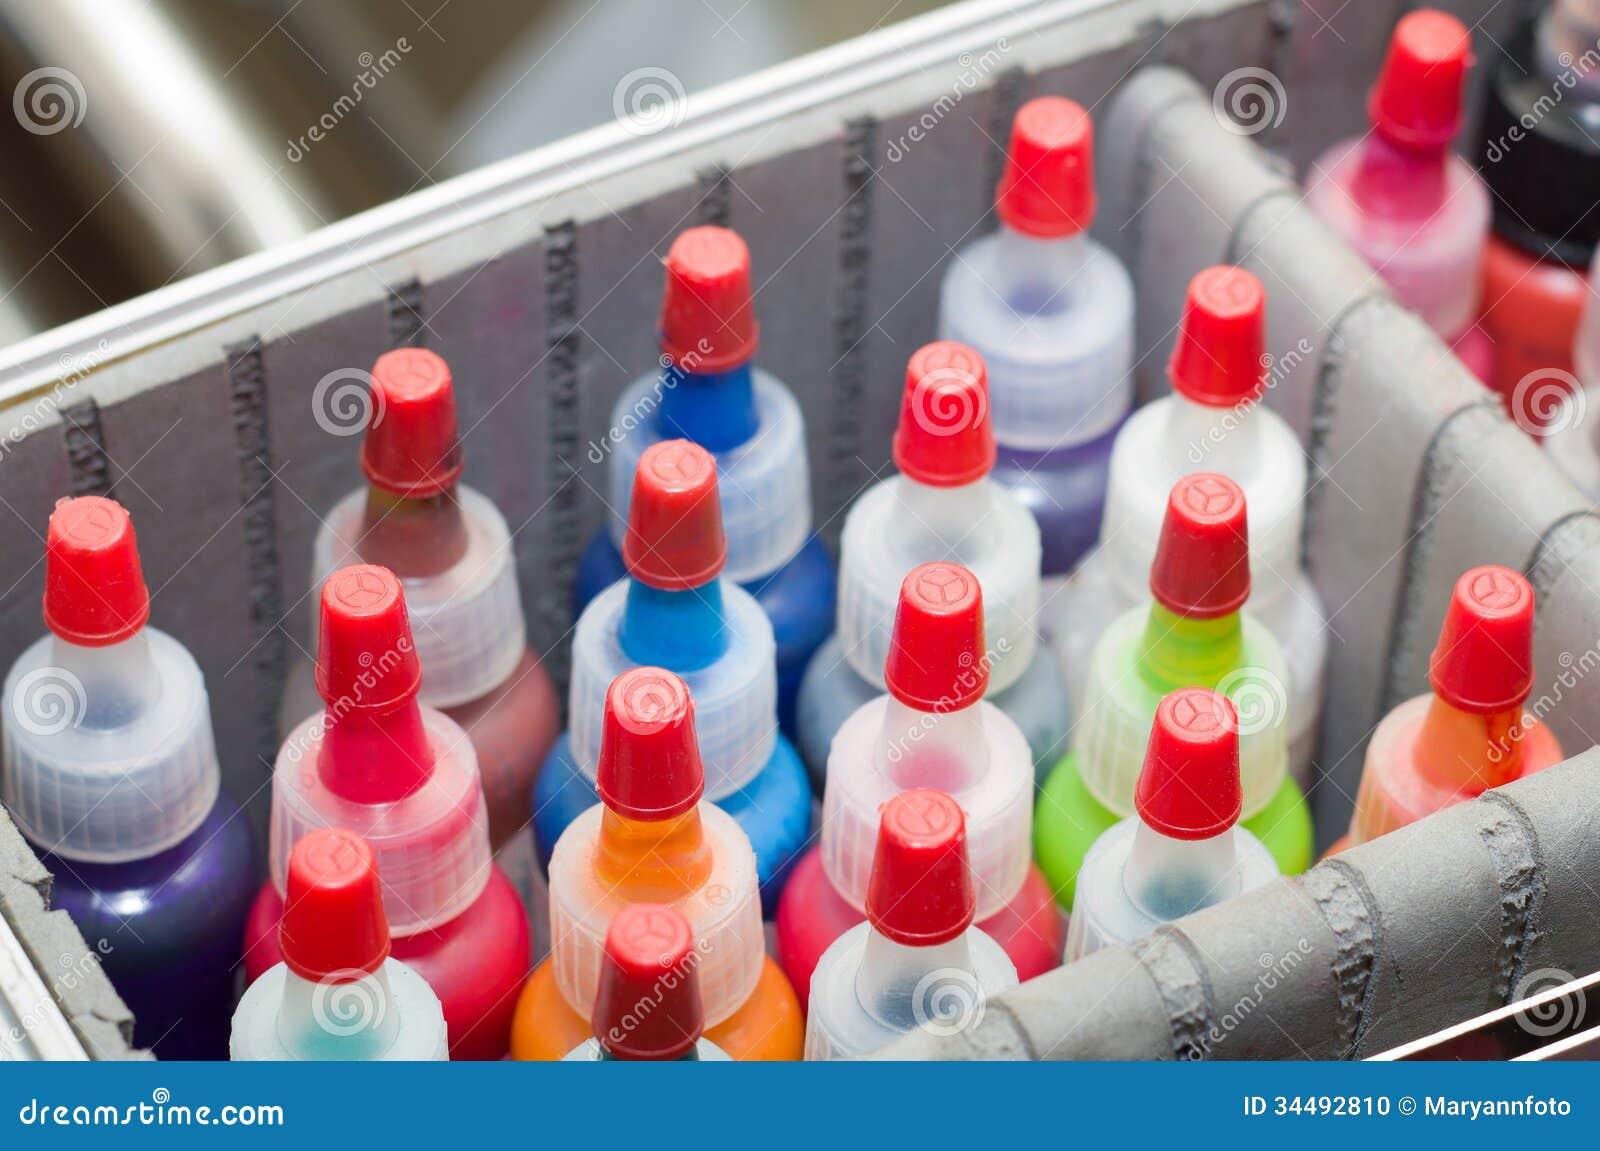 Color for a permanent makeup